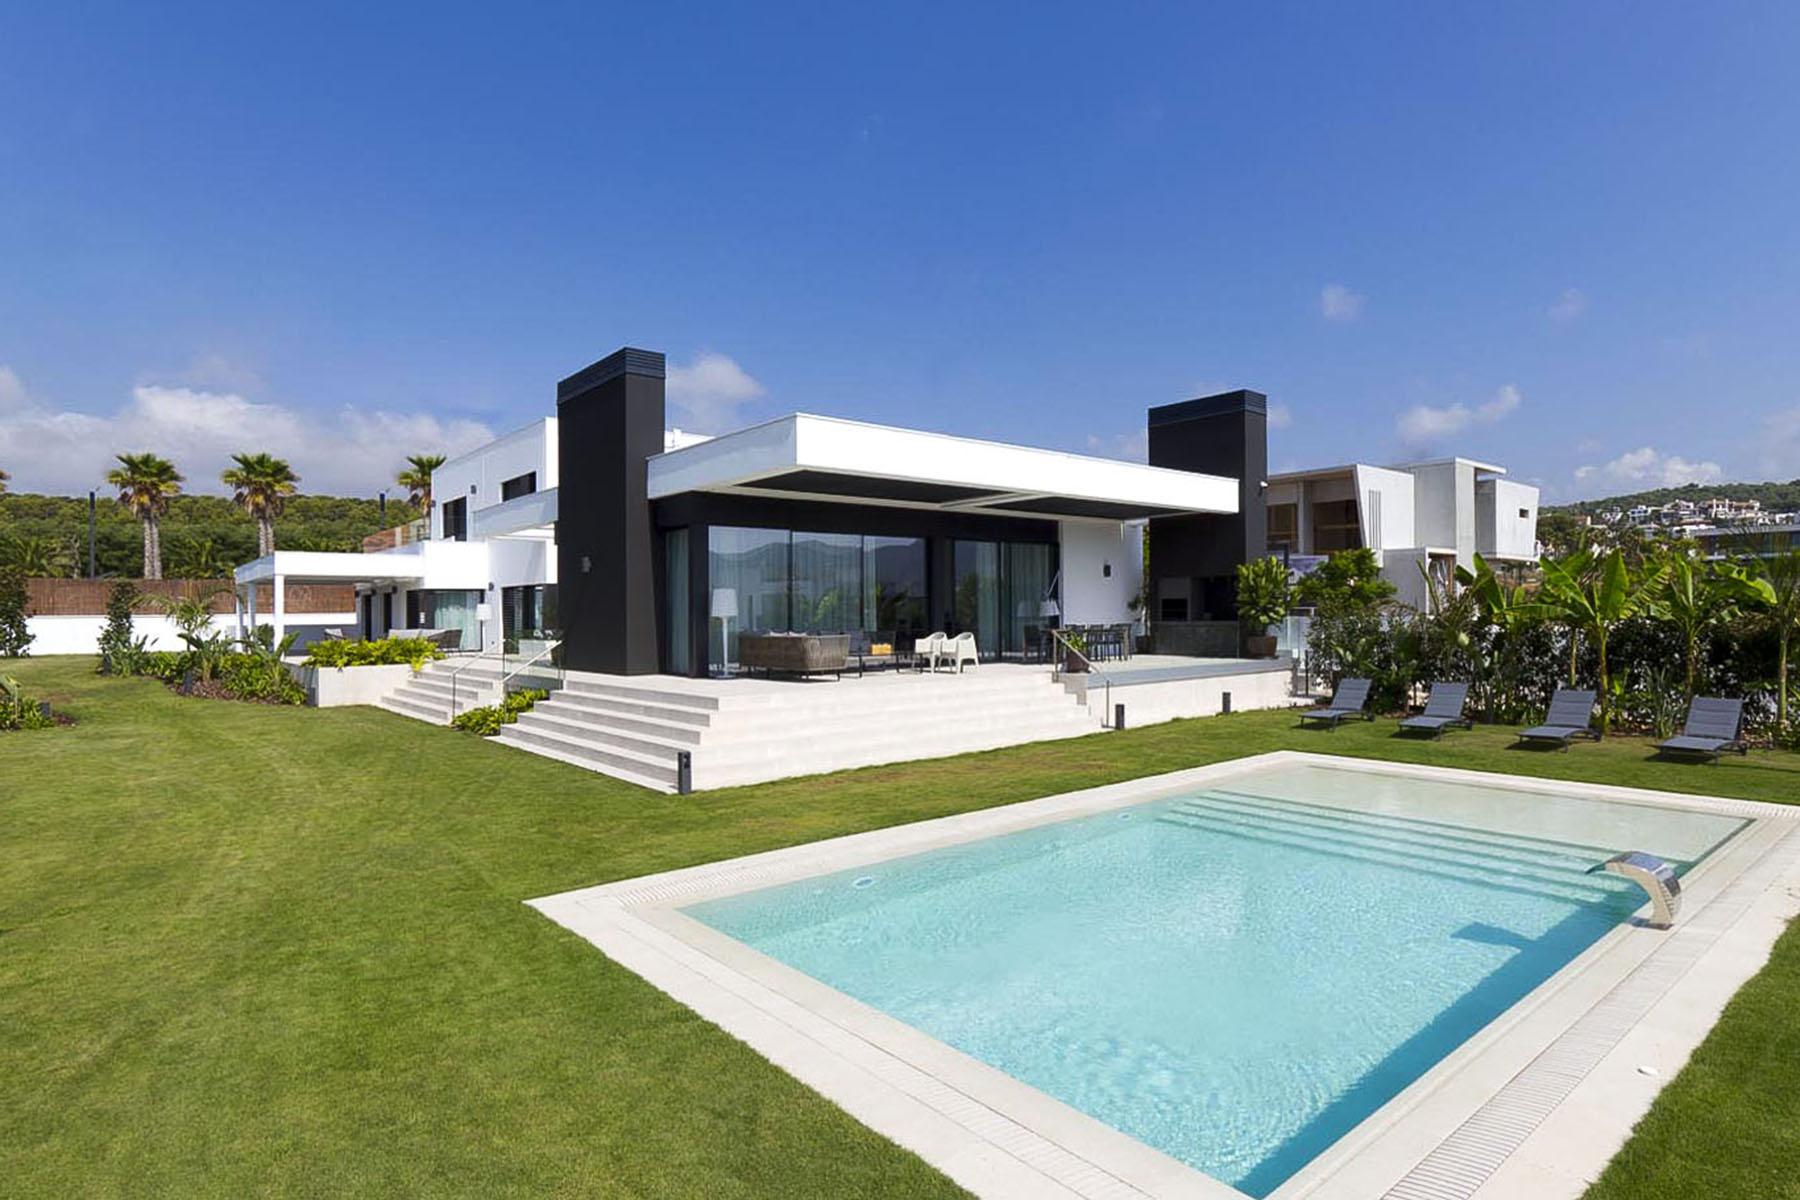 singular-detached-house-la-plana-de-sitges-barcelona